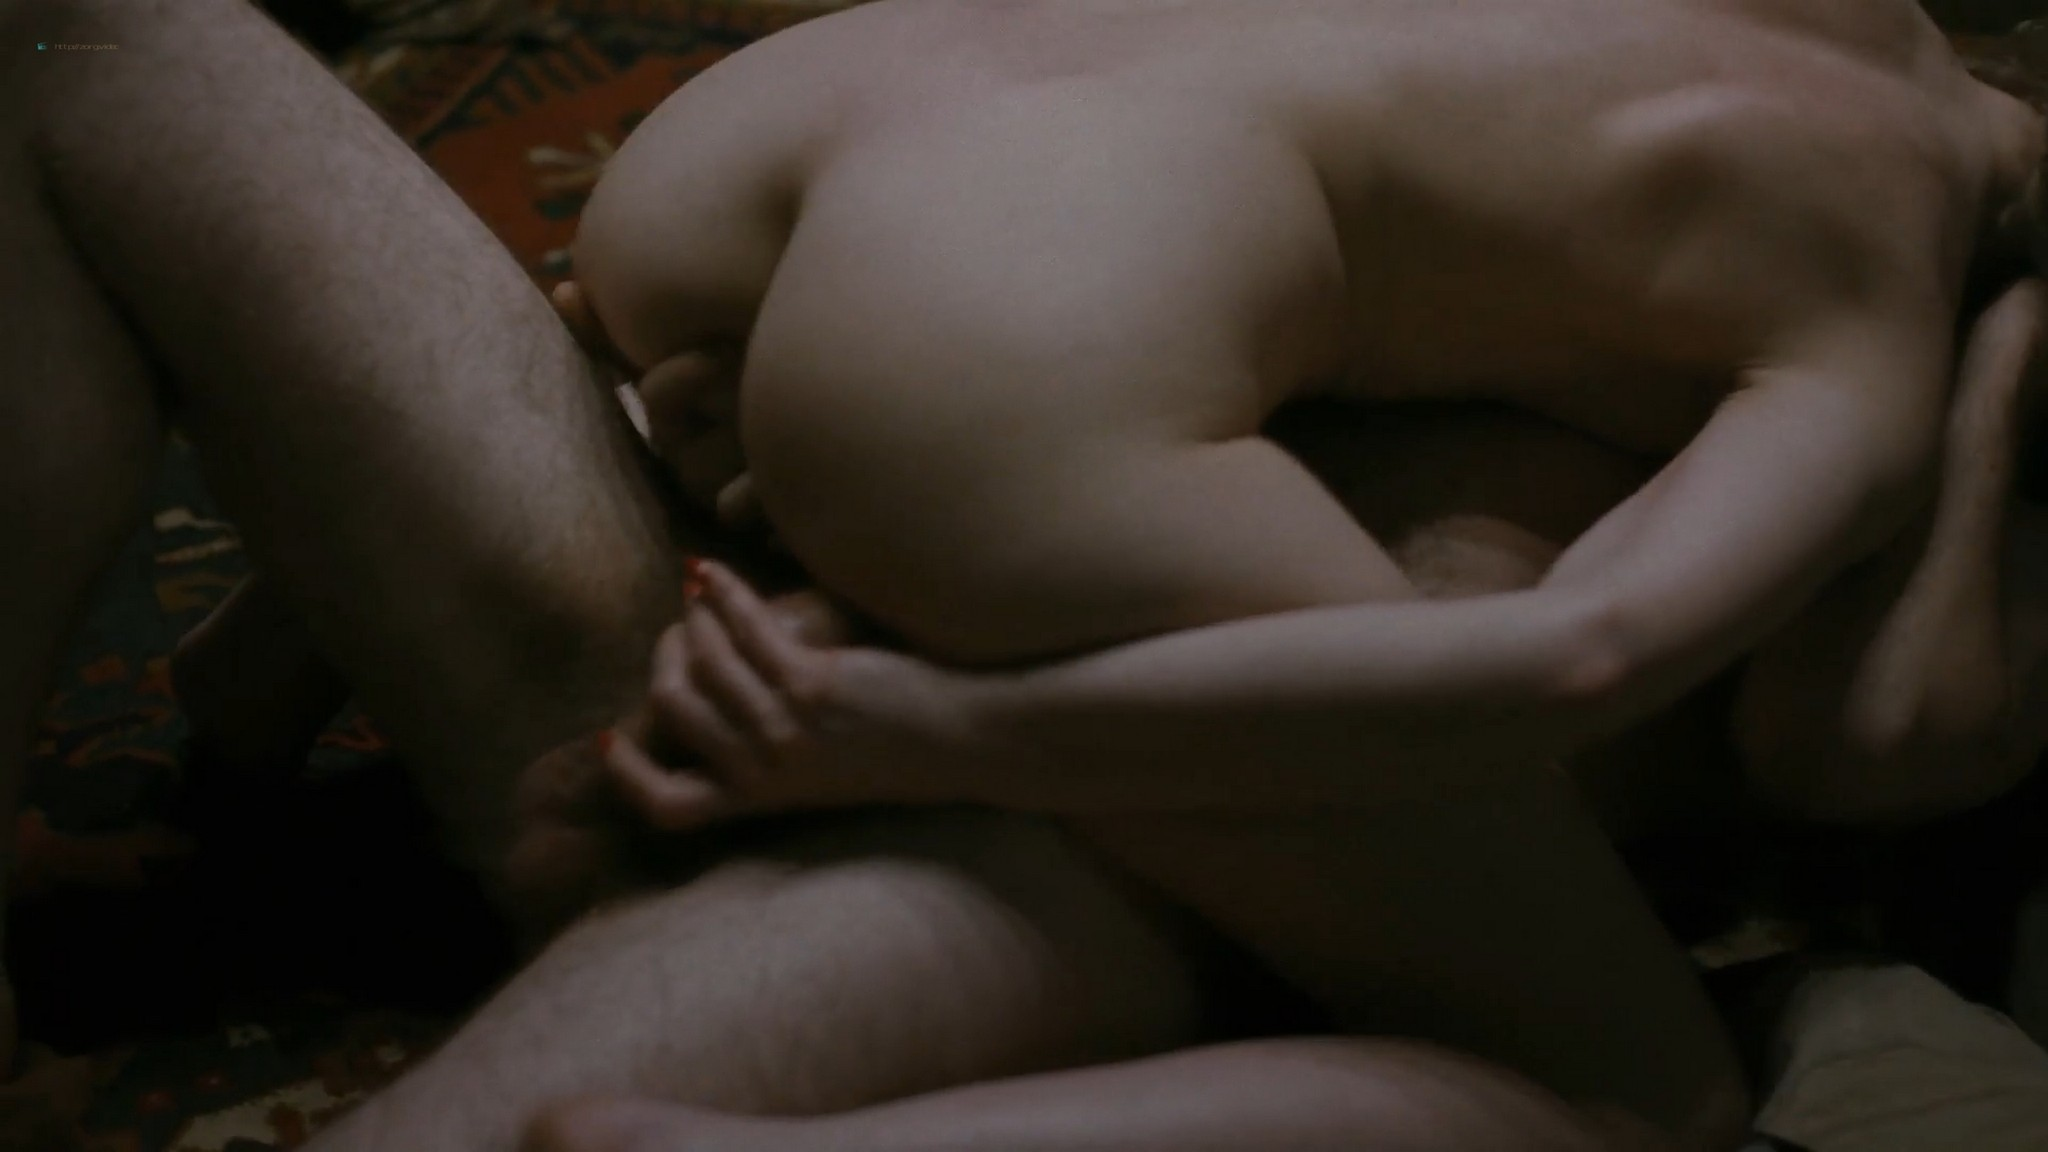 Olga Shkabarnya nude Natalia Berezhnaya nude explicit sex - DAU Natasha (2020) HD 1080p Web (15)